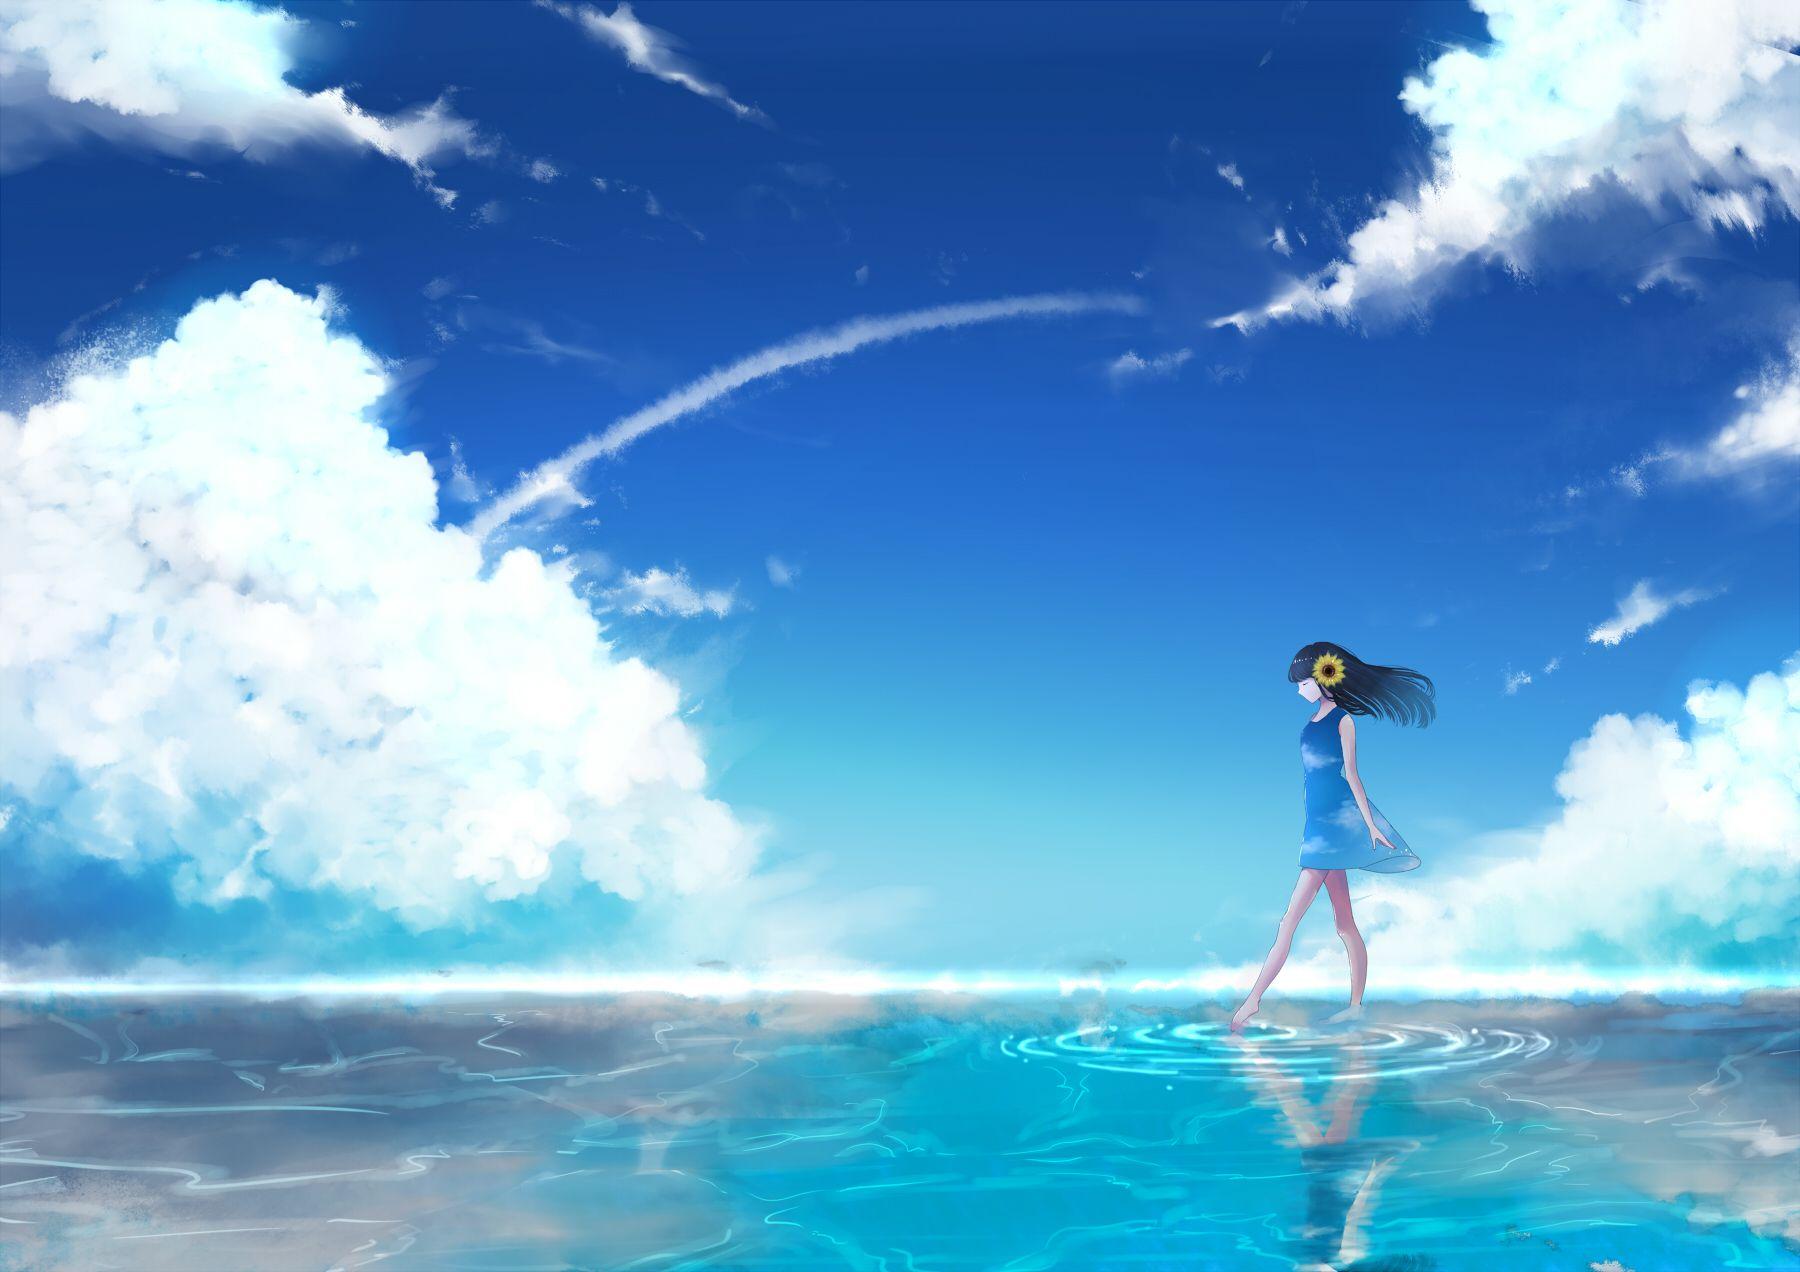 Ocean Anime Wallpapers - Wallpaper Cave